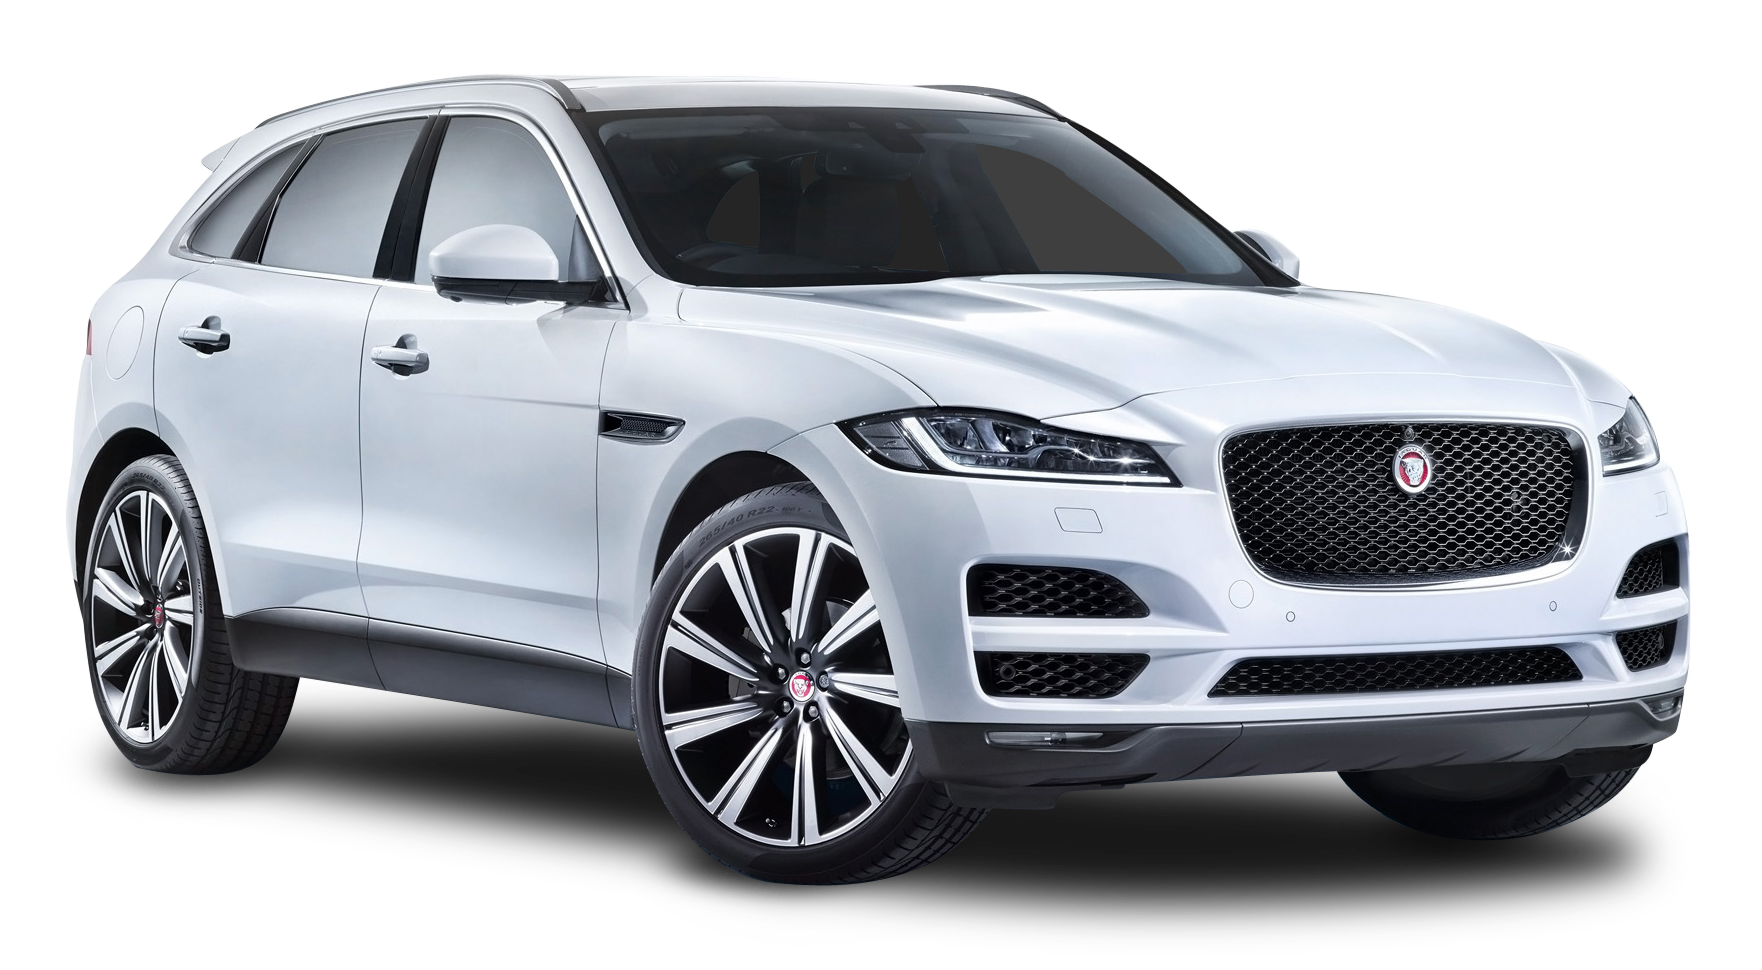 Jaguar F Pace White Car Jaguar Car Jaguar Suv White Car